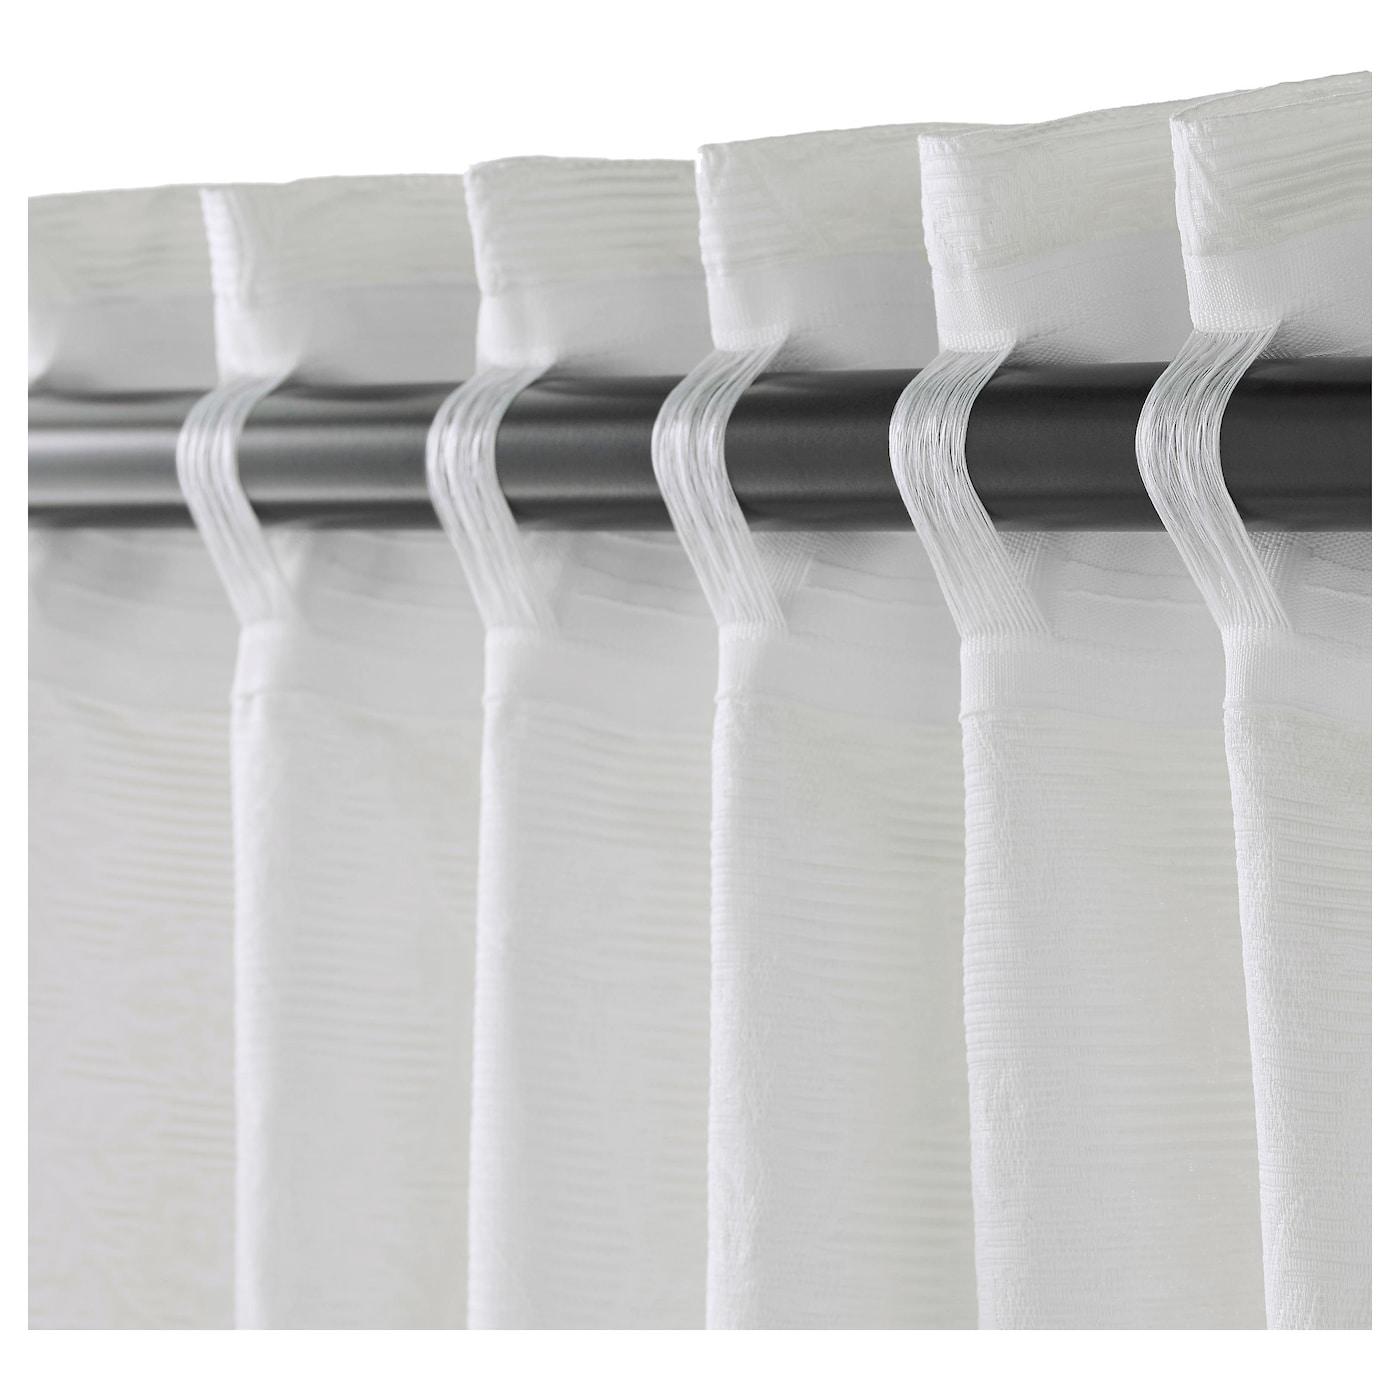 blekviva gordijnen met embrasse 1 paar wit 145x300 cm ikea. Black Bedroom Furniture Sets. Home Design Ideas